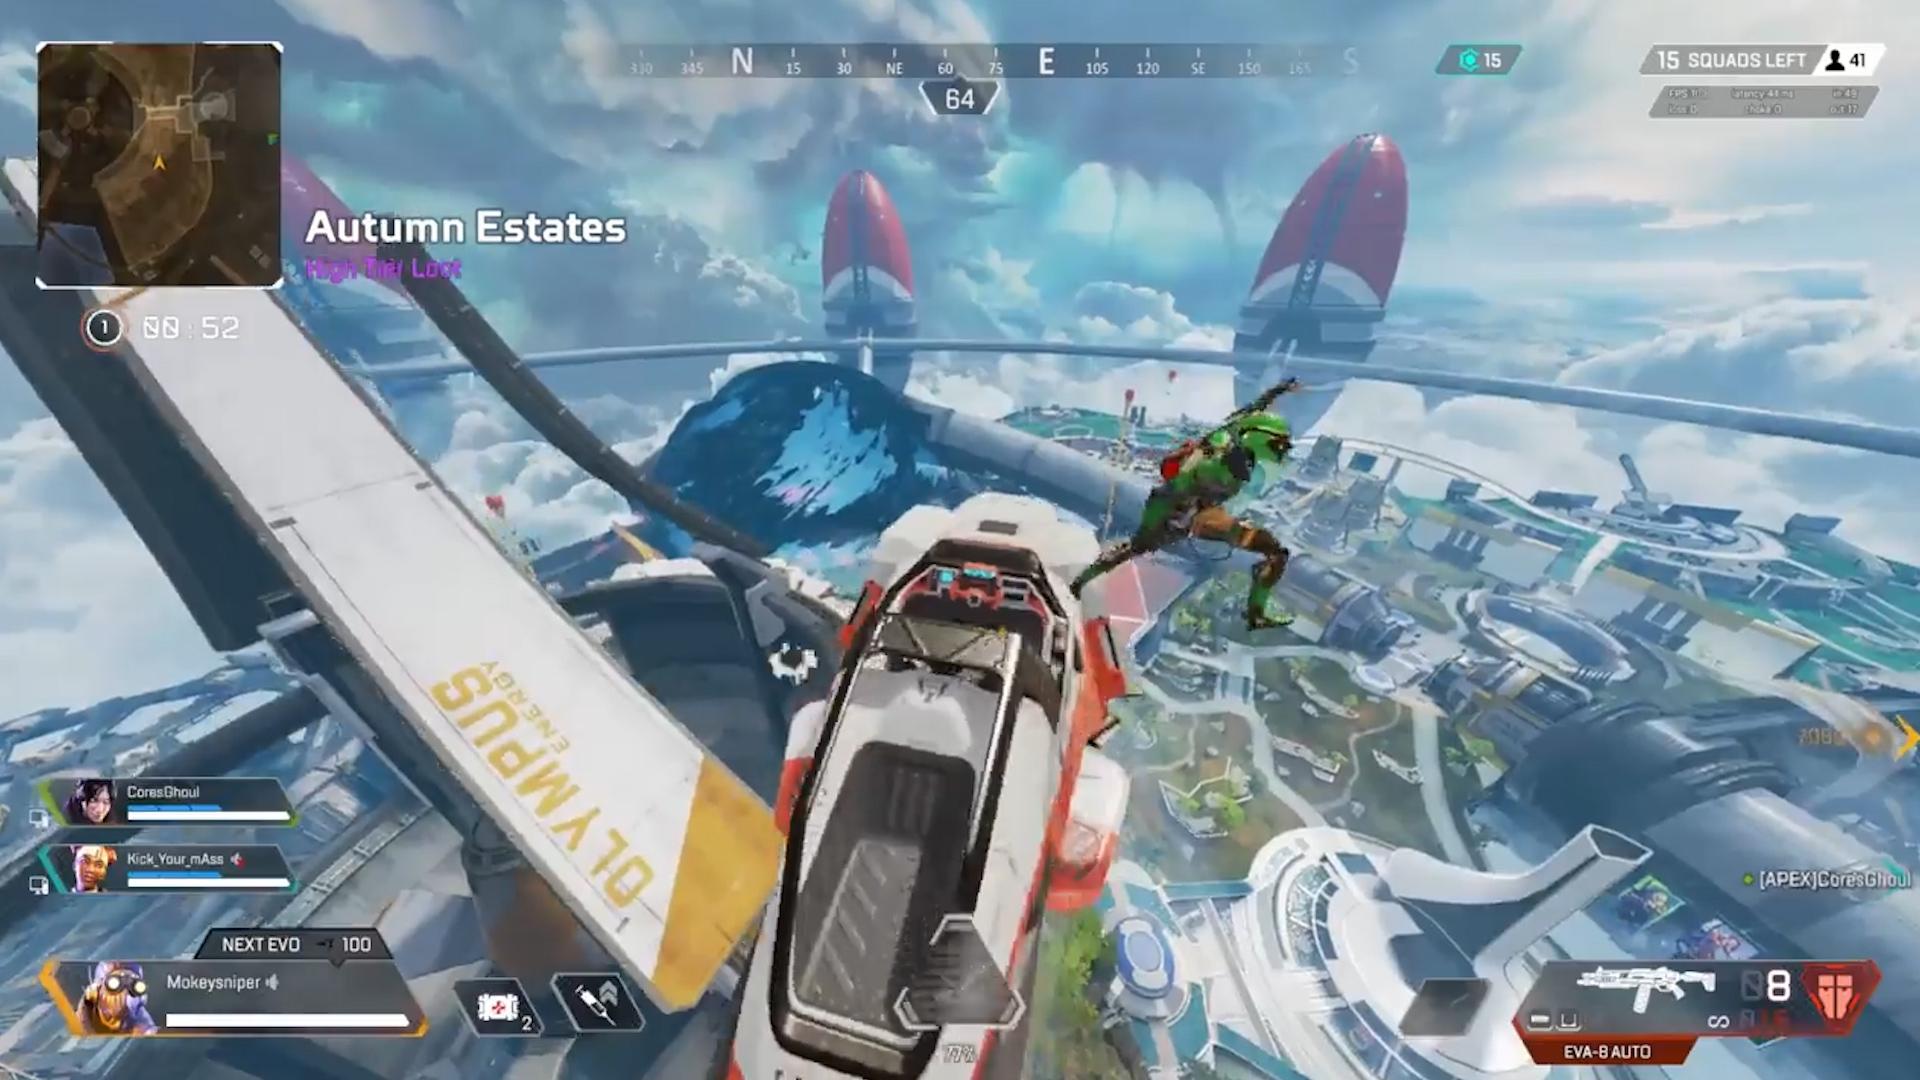 【APEX】トライデントぶっ飛びバグを使ったオクタンの悲劇